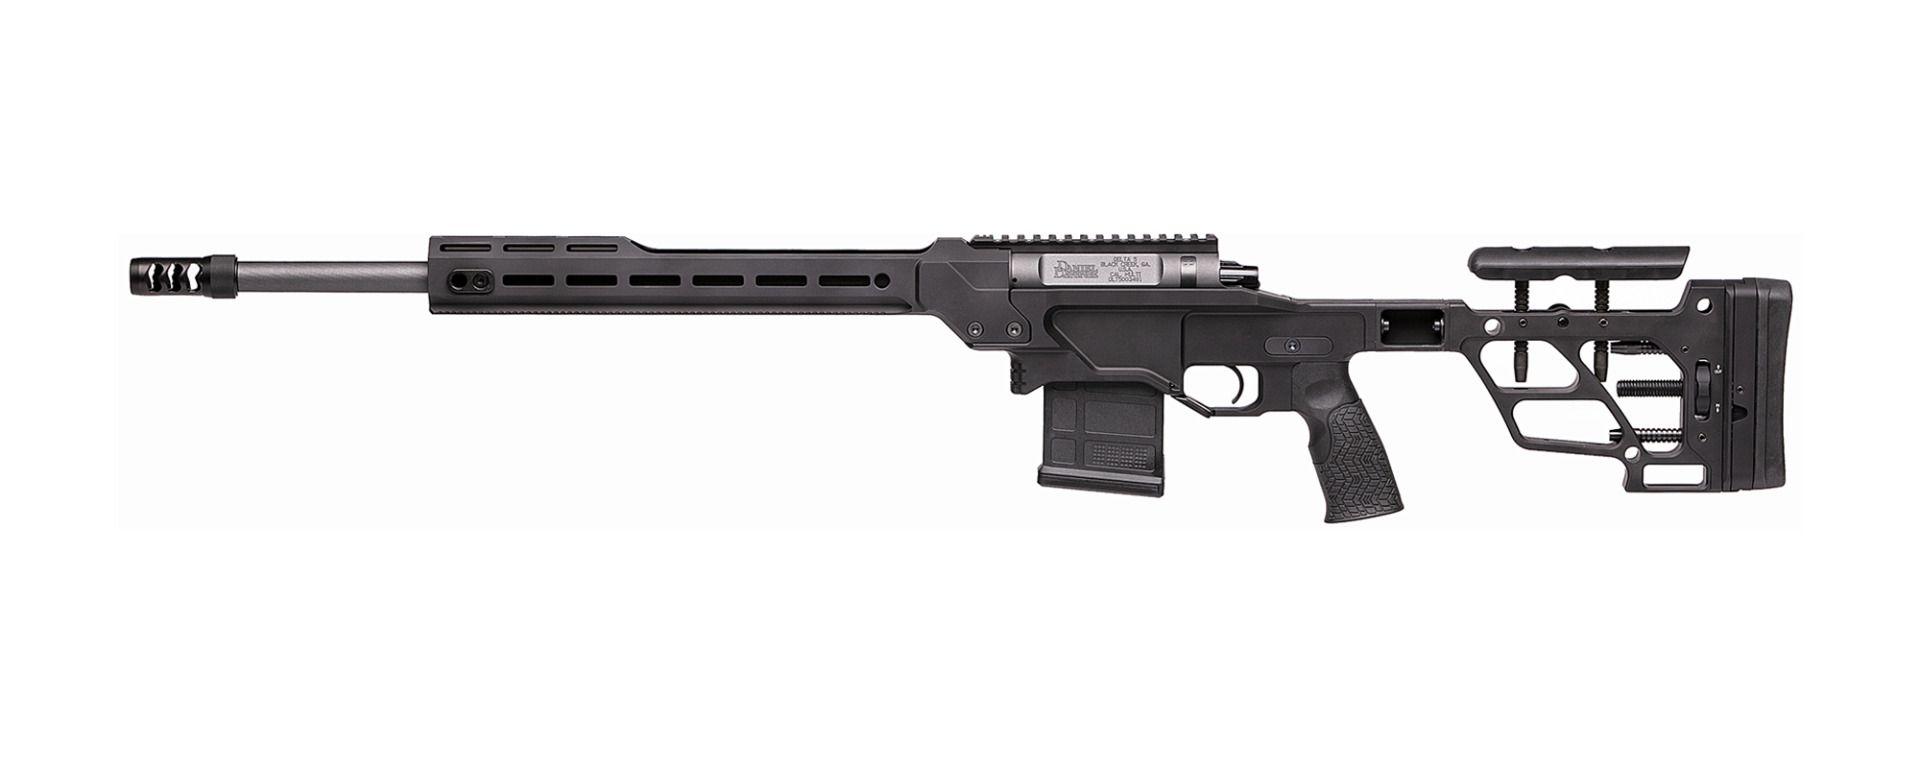 daniel defense delta 5 pro precision rifle bolt action sniper rifle 6mm CR 6.5 creedmoor